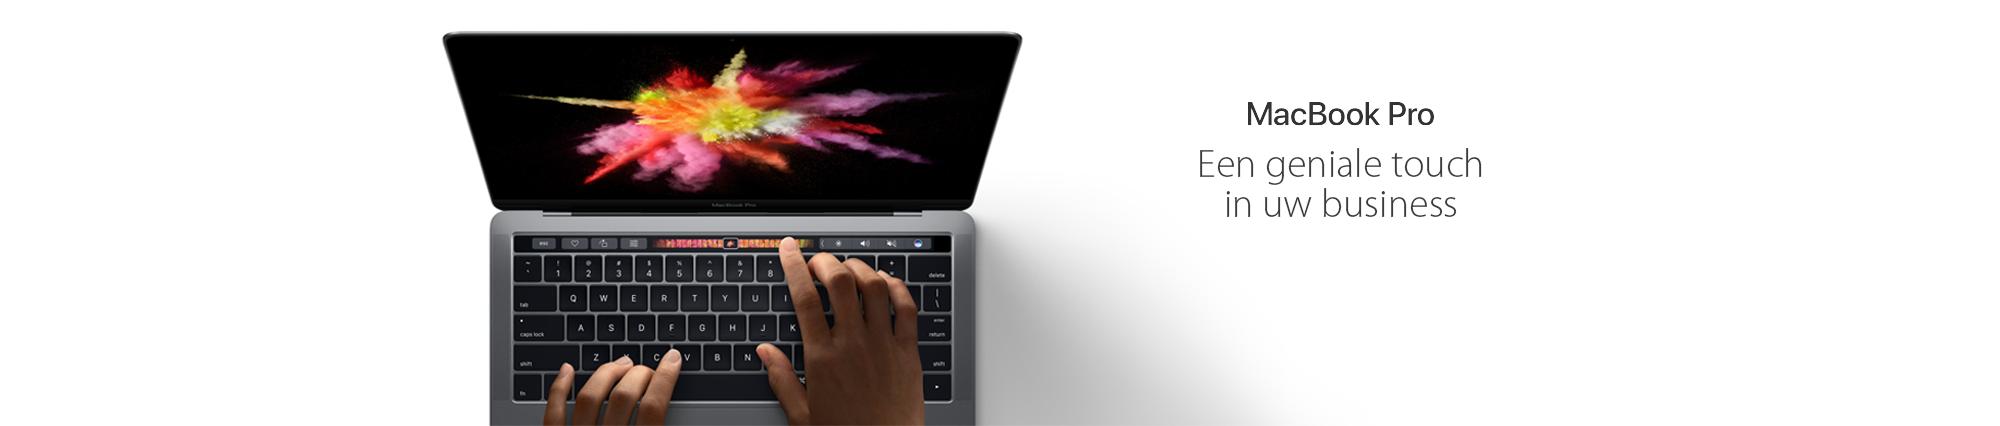 news-MacBookPro_sg_banner copy.png